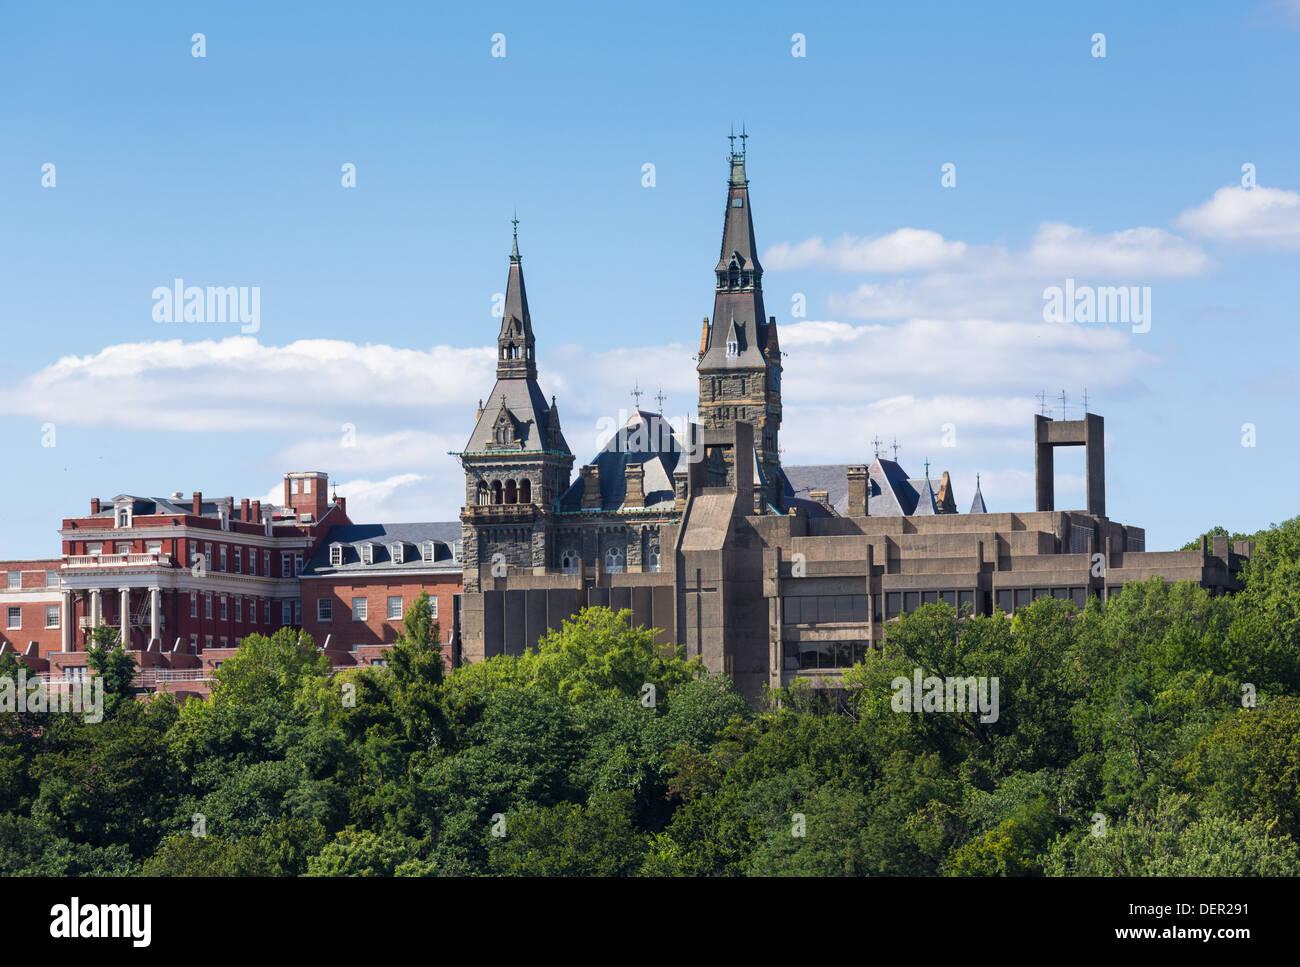 Georgetown University in Washington DC - Stock Image